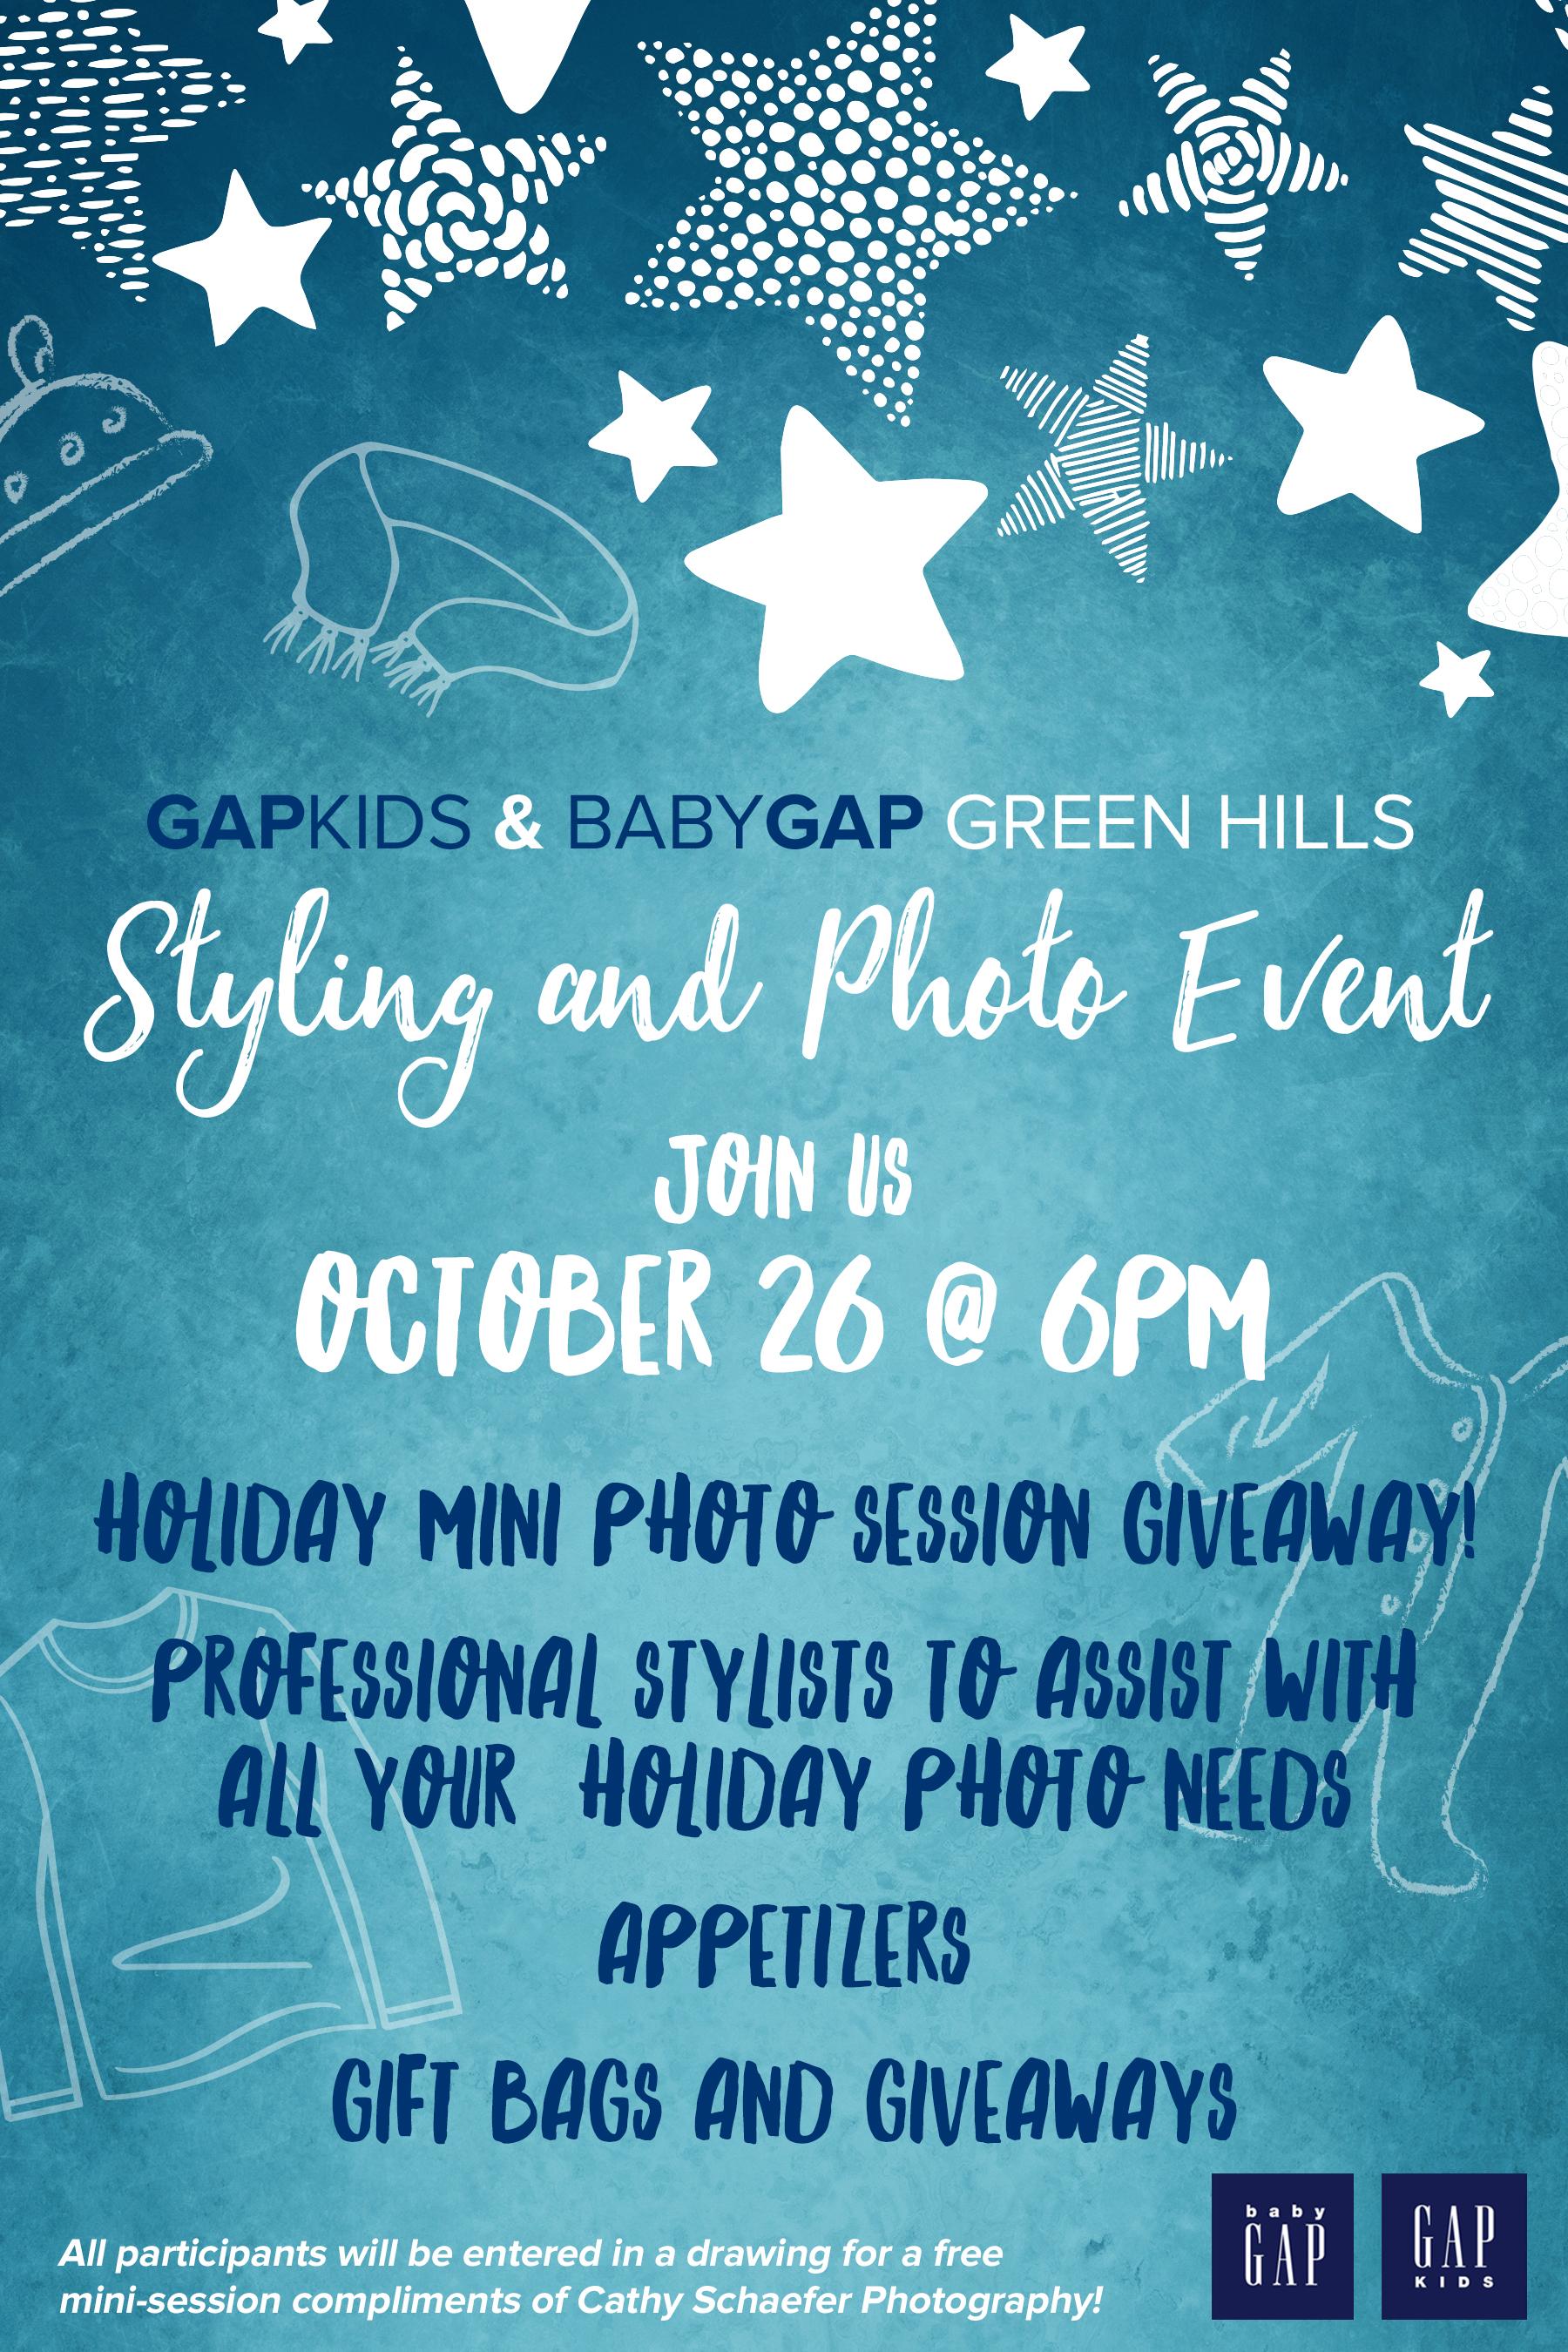 Event Flyer || GapKids, Green Hills Location